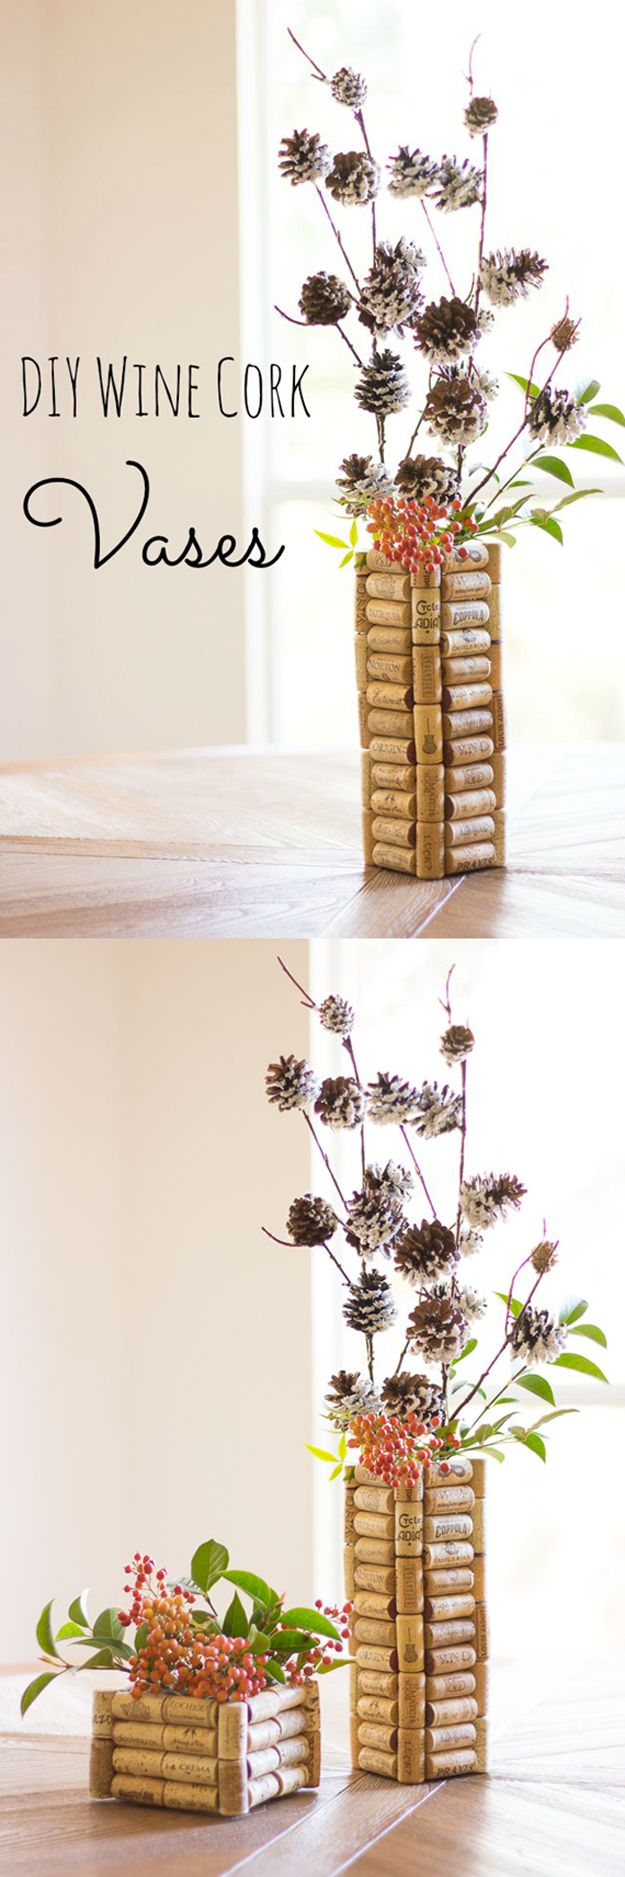 Spring Craft Ideas: DIY Wine Cork Vases | Easy DIY Wine Cork Crafts by DIY Ready…